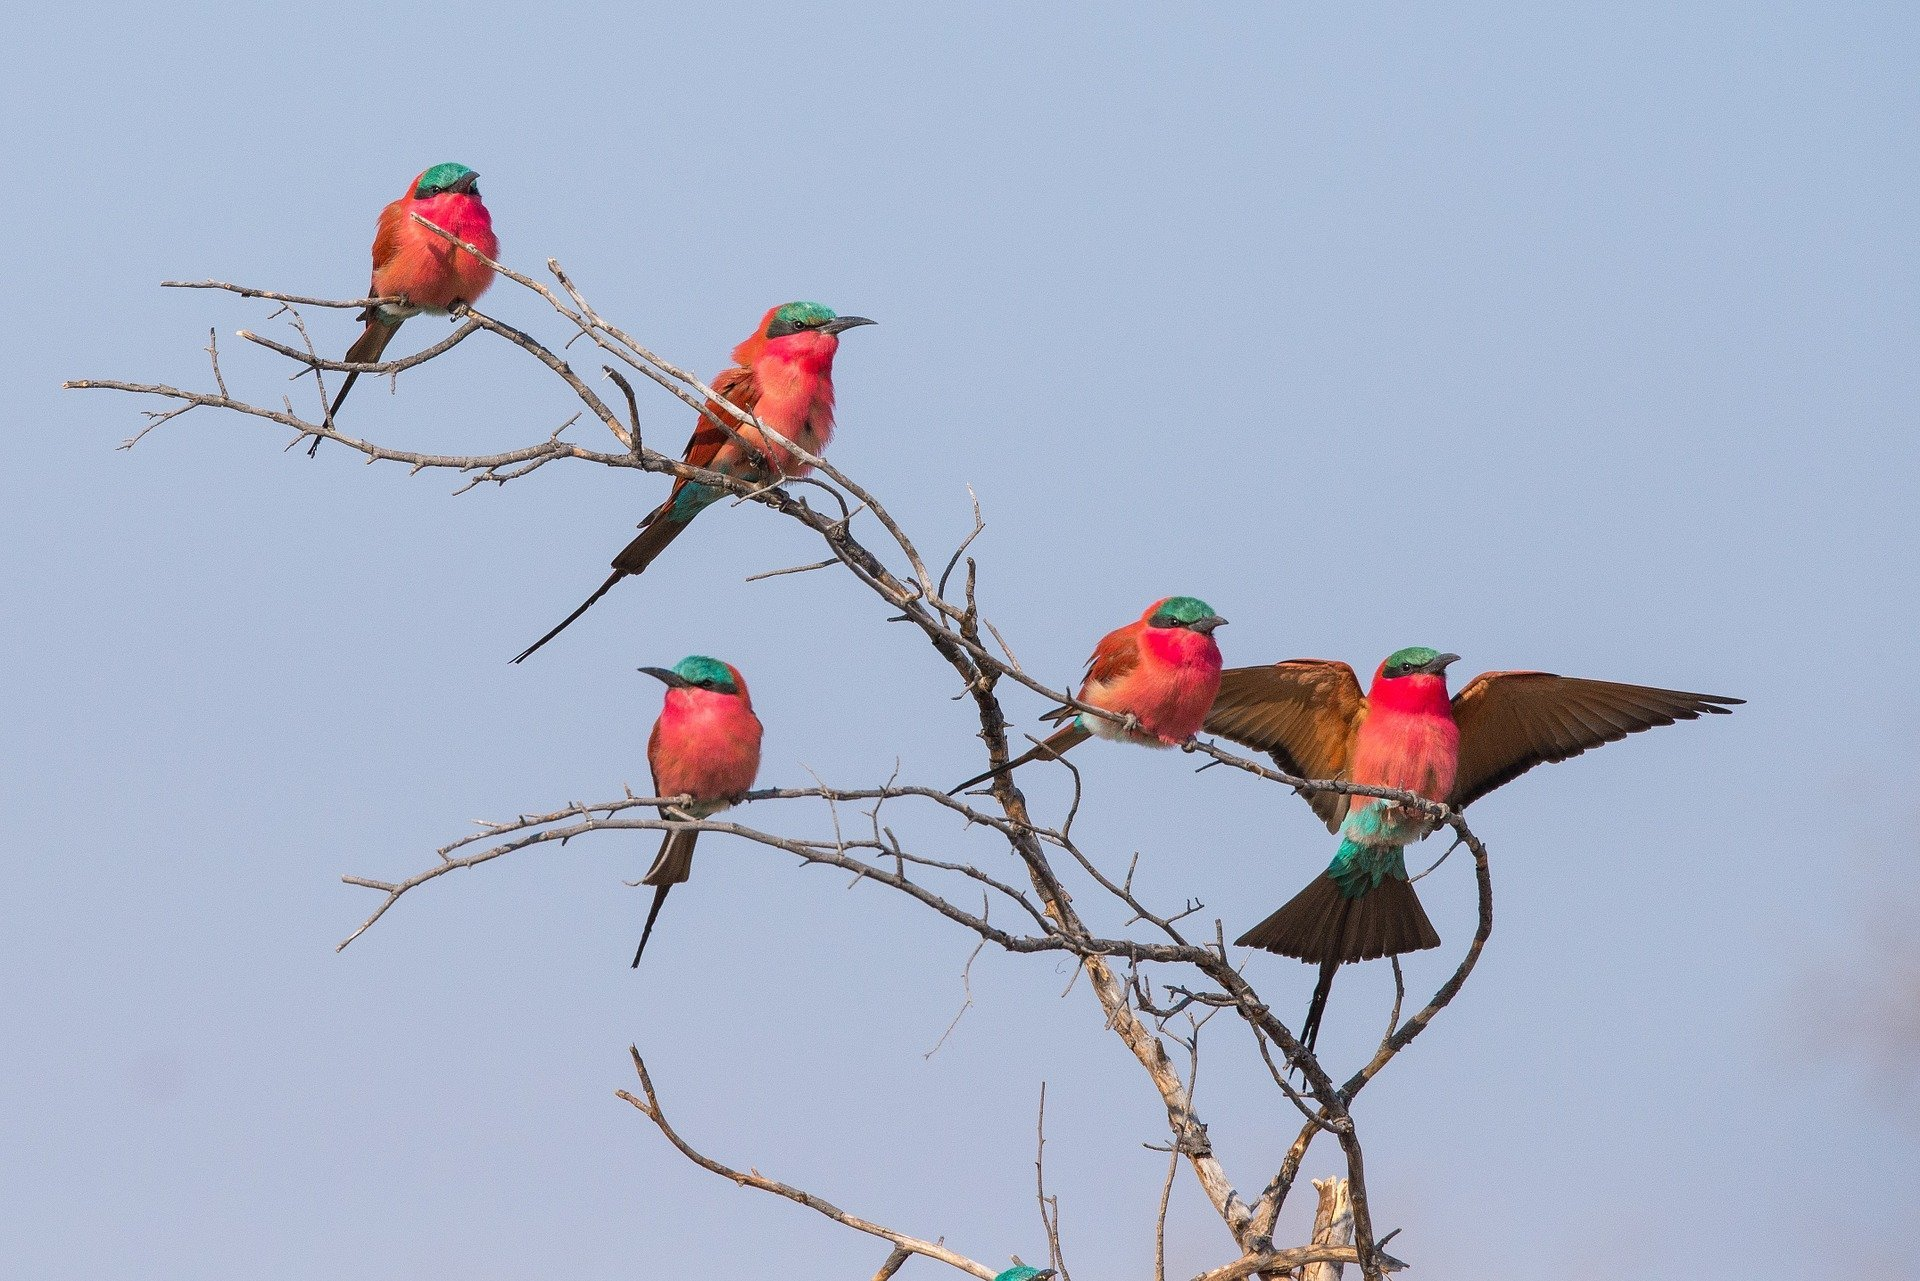 Carmine bee eaters in the Okavango Delta